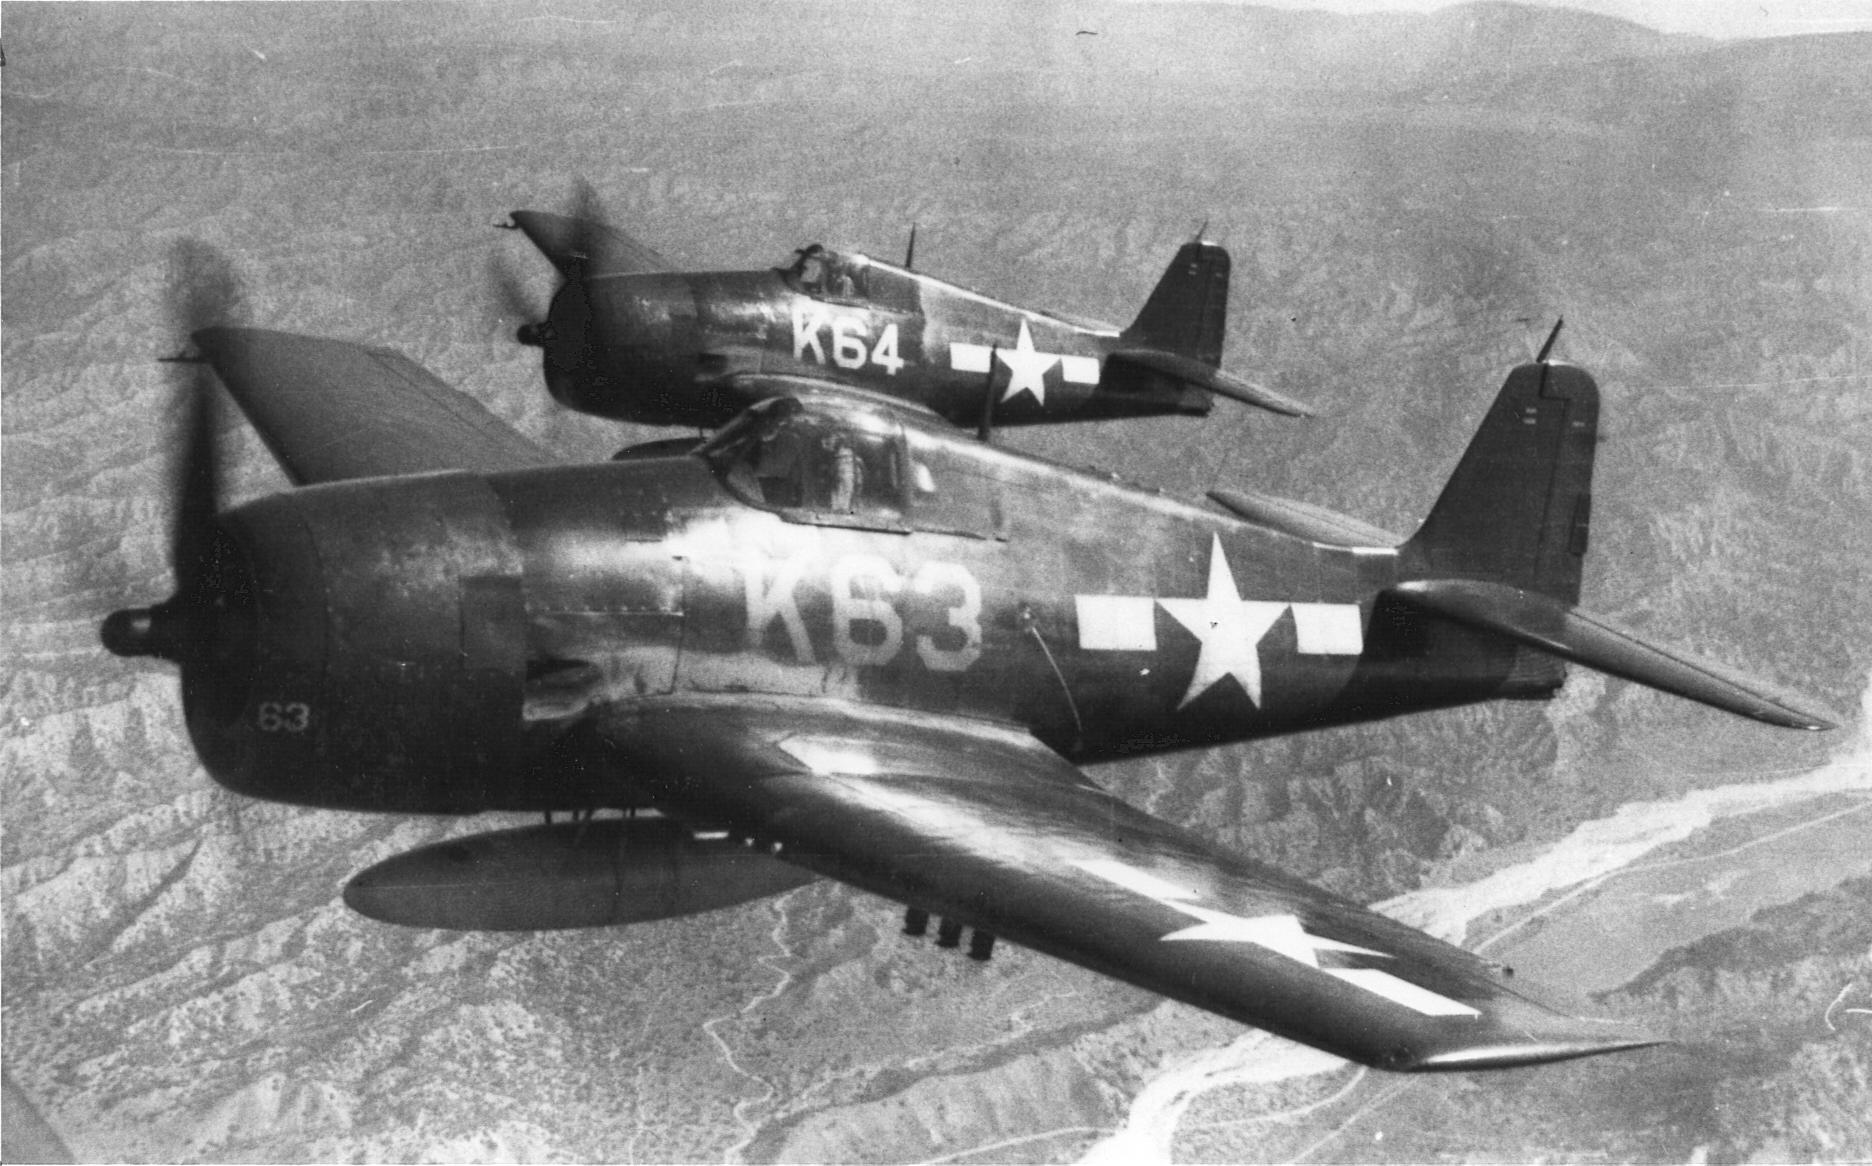 Grumman F6F 5 Hellcat VMF 321 White K63 and K64 over MCAS El Toro CA 01